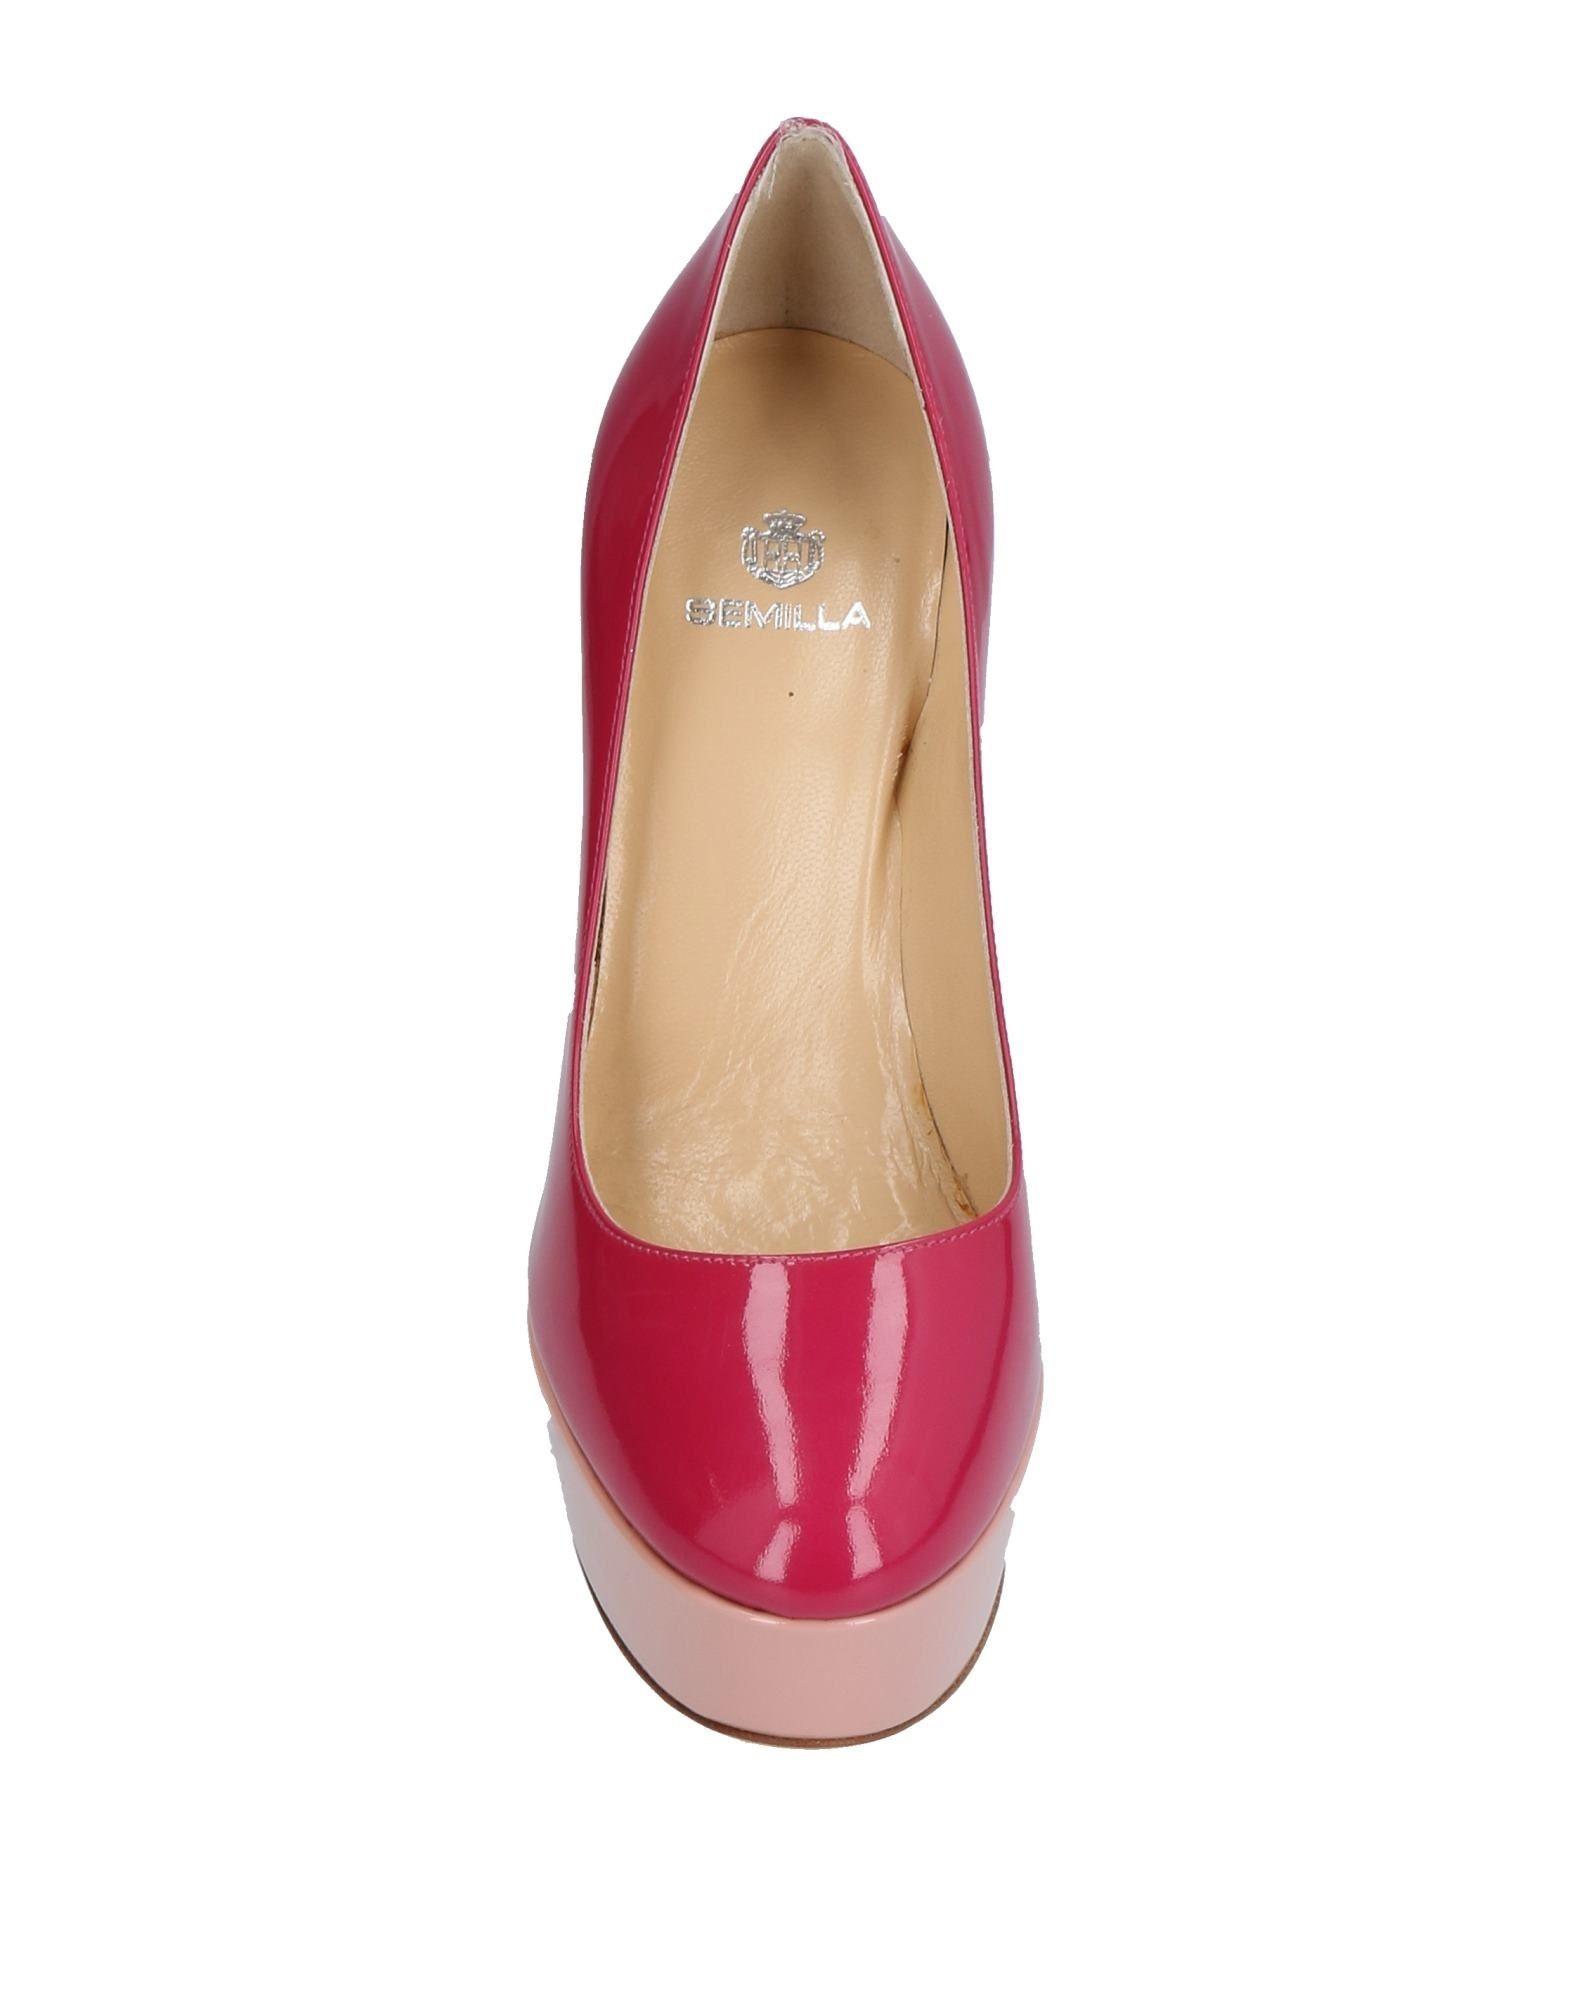 Gut Damen um billige Schuhe zu tragenSemilla Pumps Damen Gut 11484719CE 815c98